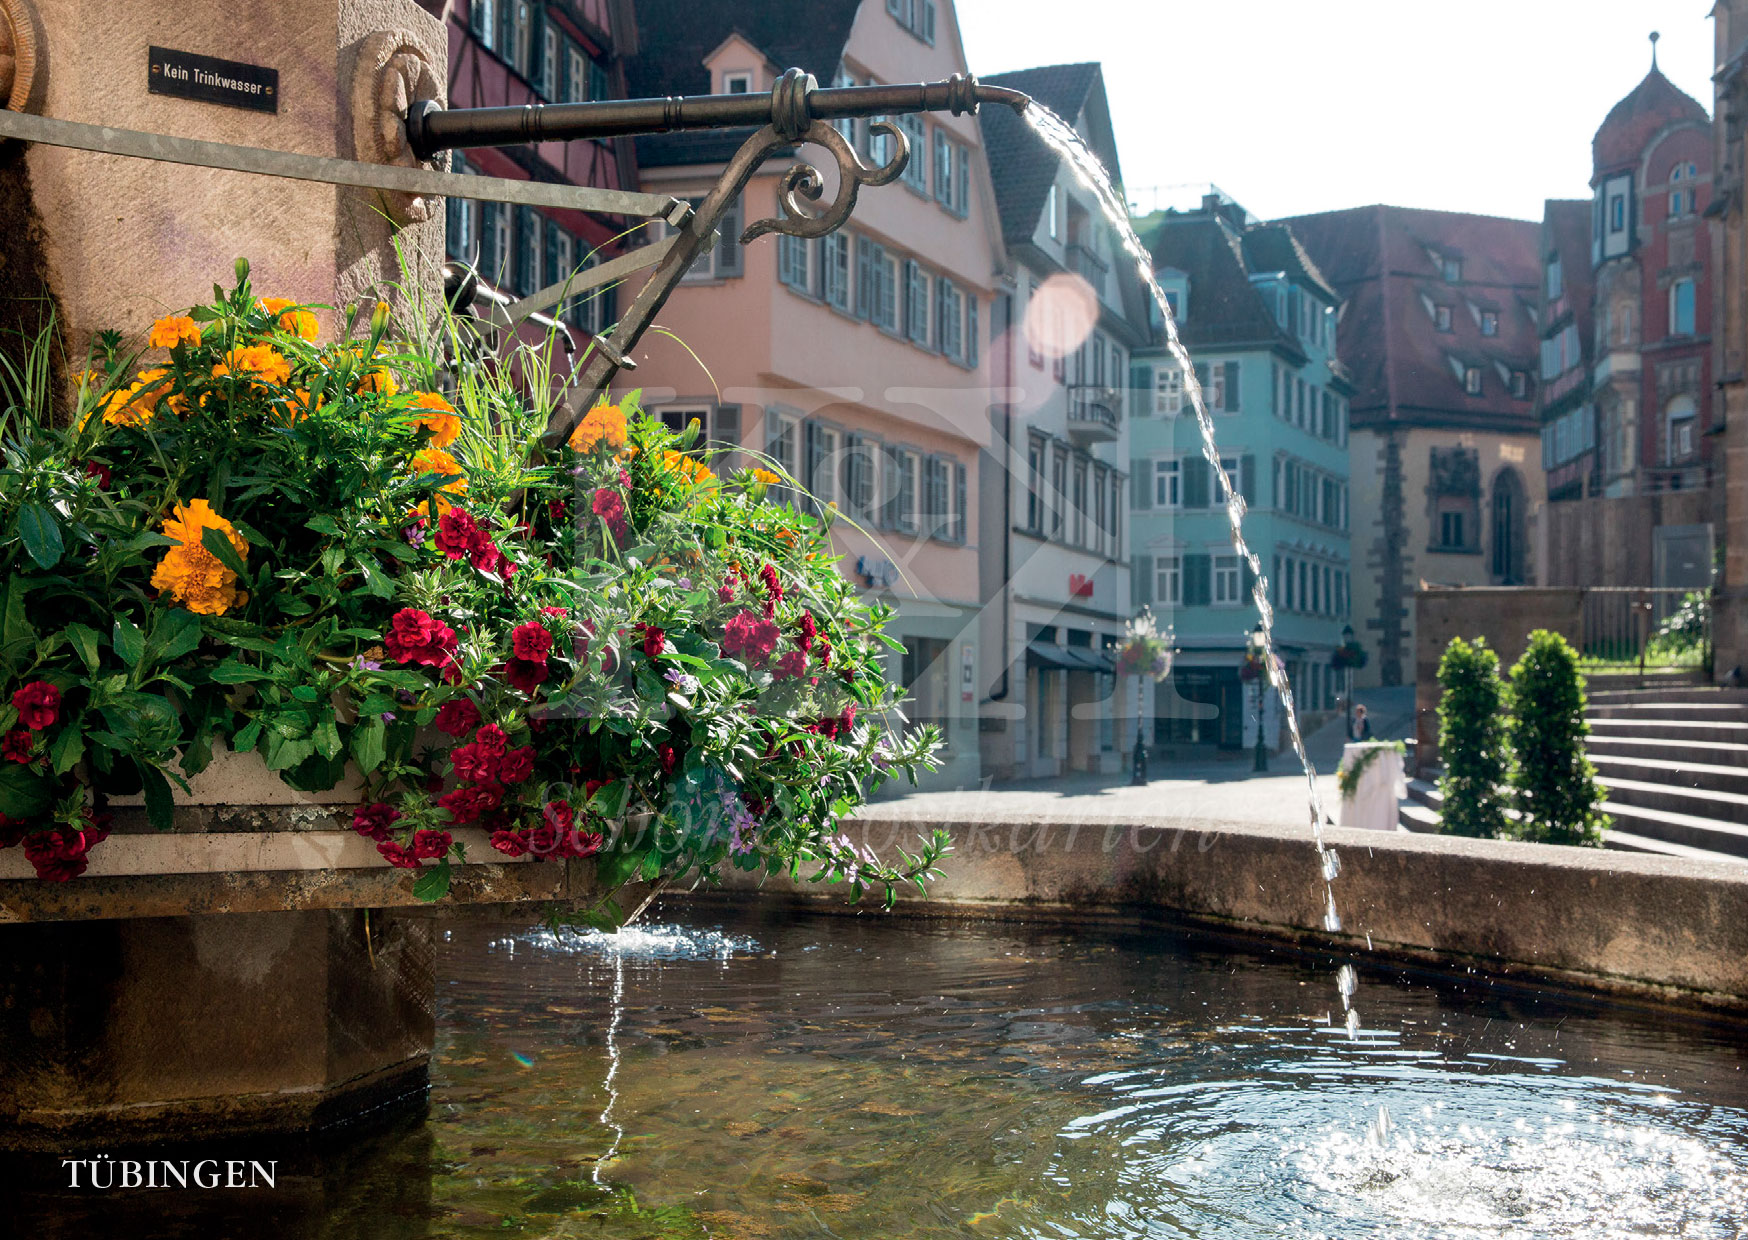 Schöne Postkarte Nr. 91 · Georgsbrunnen am Holzmarkt in Tübingen · © www.schoenepostkarten.de